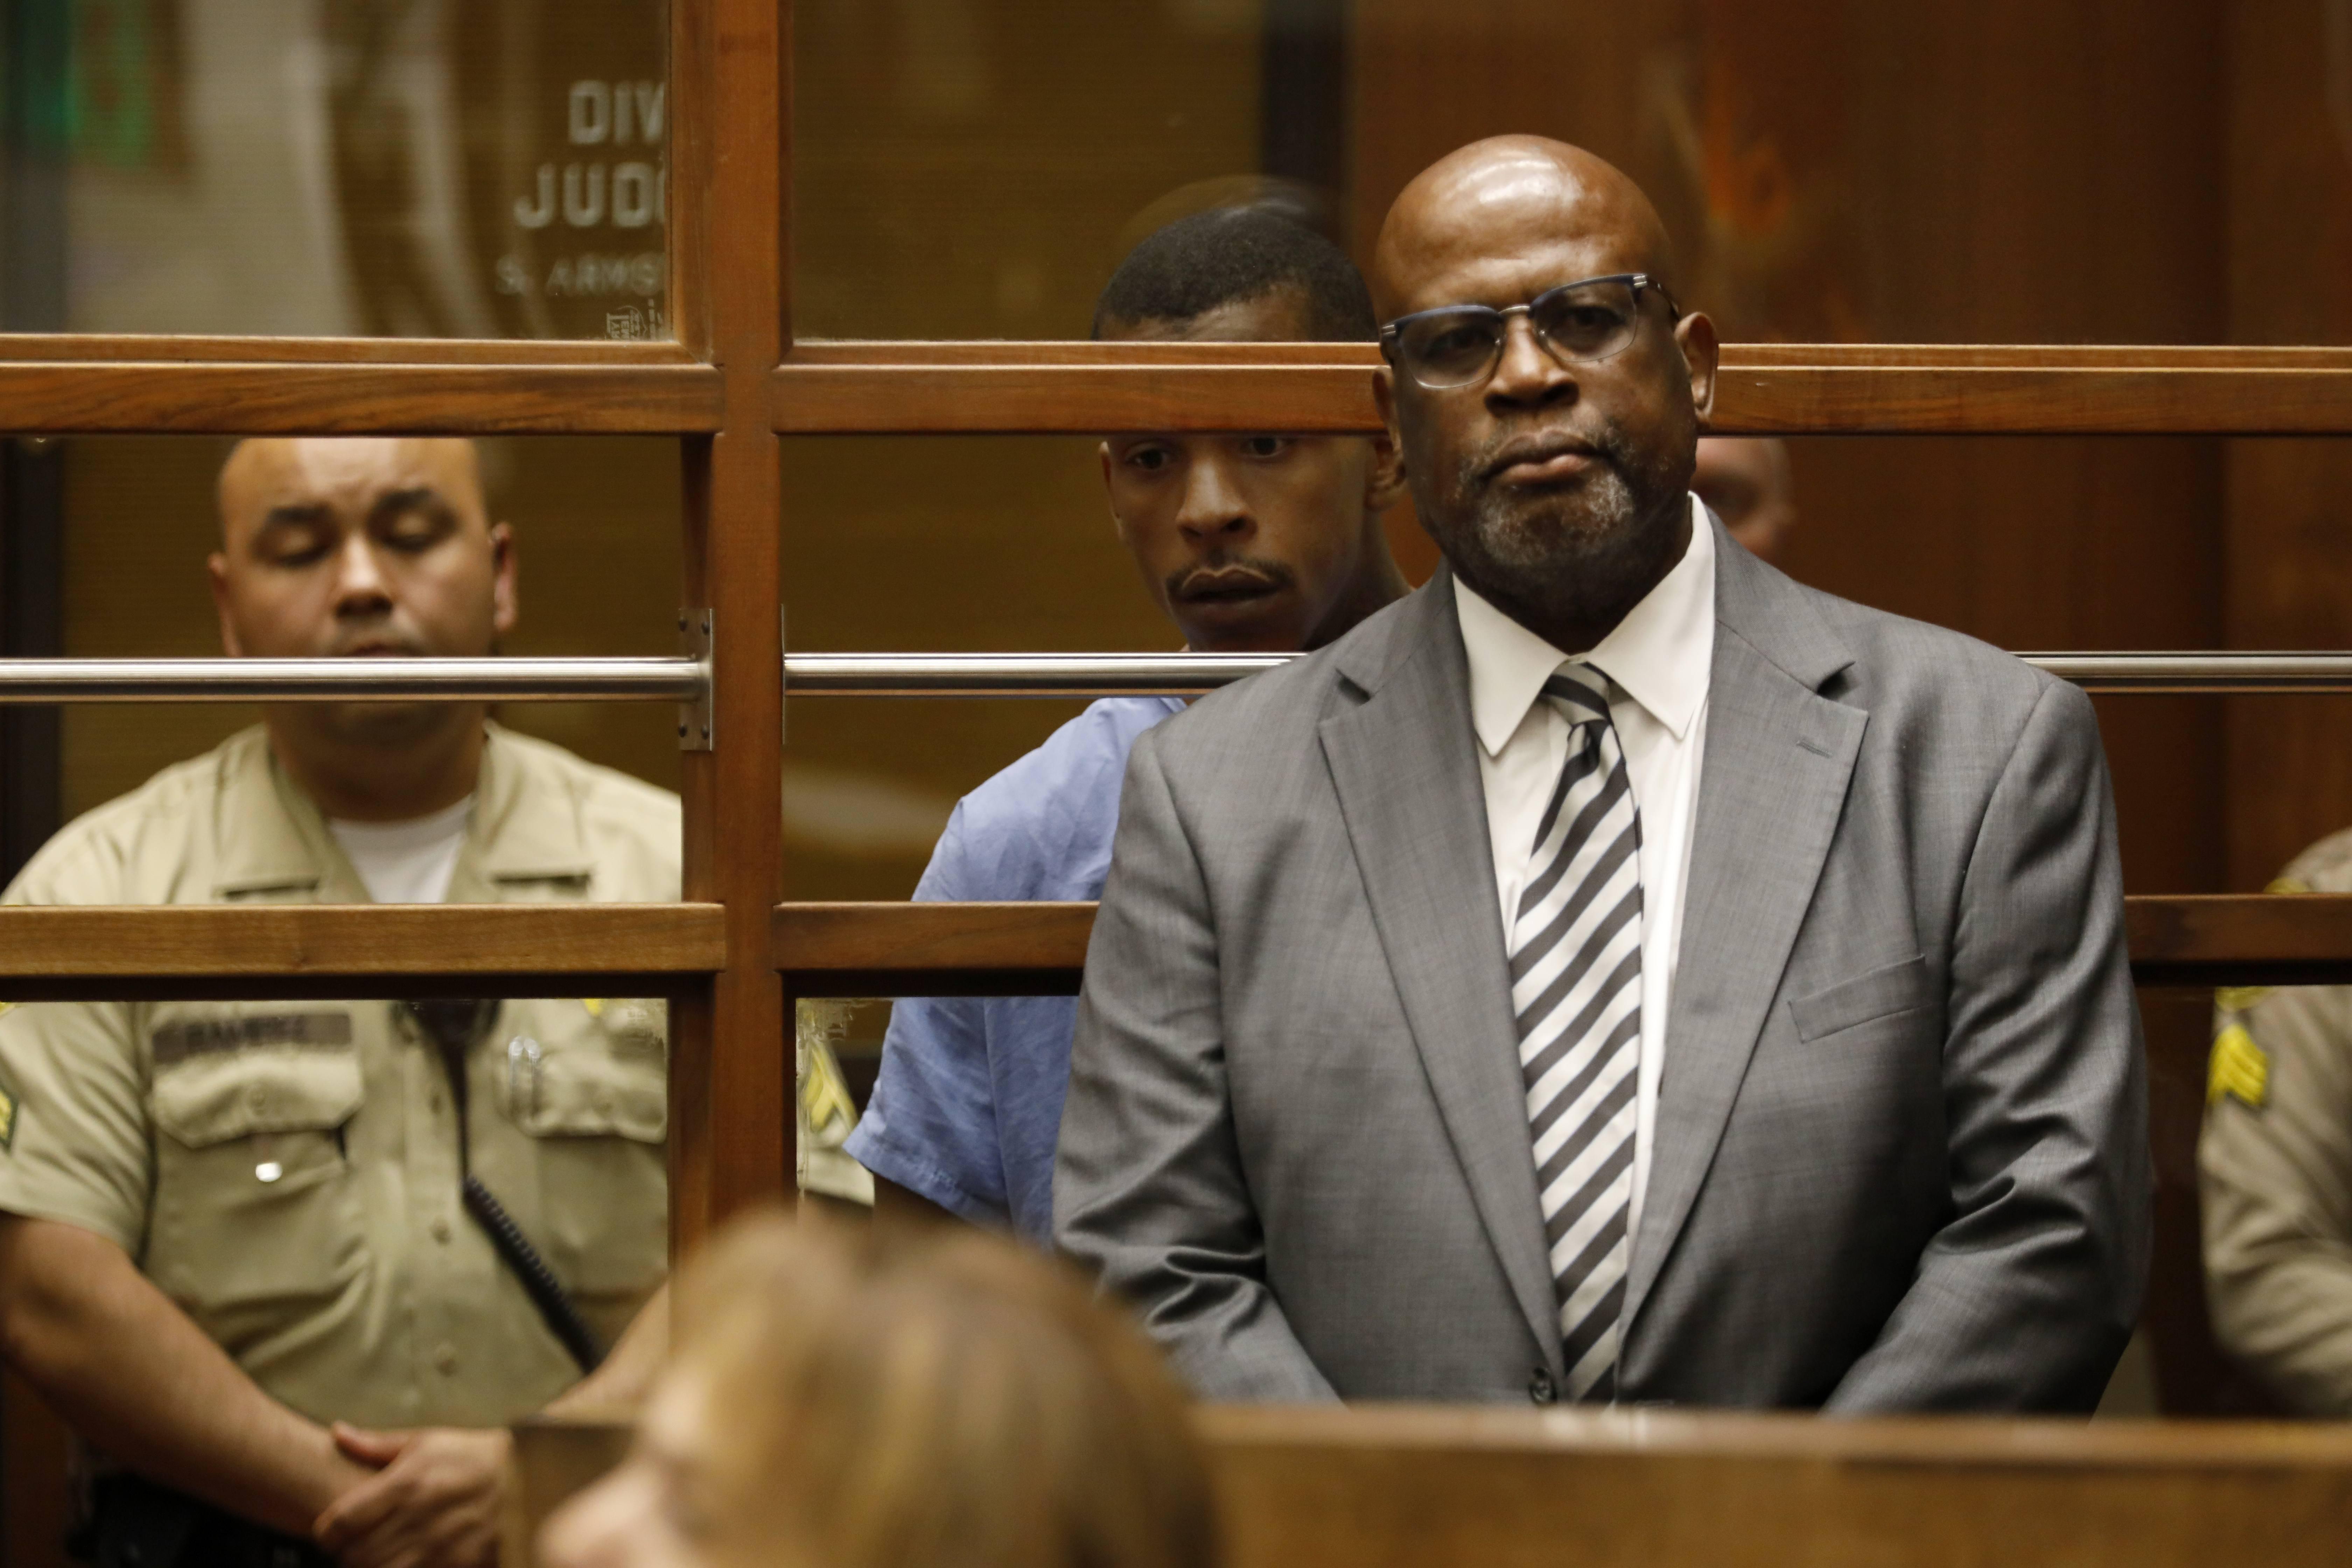 Rapper Nipsey Hussle's Alleged Killer Eric Holder Makes ... Oj Simpson Not Guilty Plea